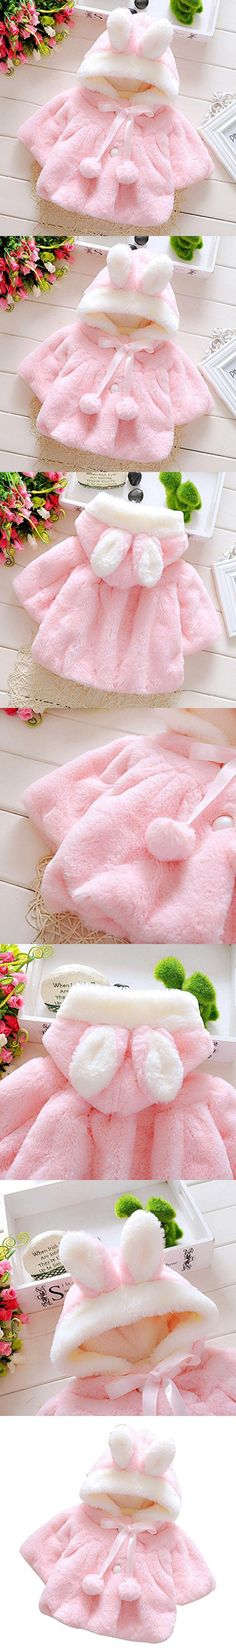 Binmer(TM) Baby Infant Girls Fur Winter Warm Coat Cloak Jacket Thick Warm Clothes (12M, Pink)